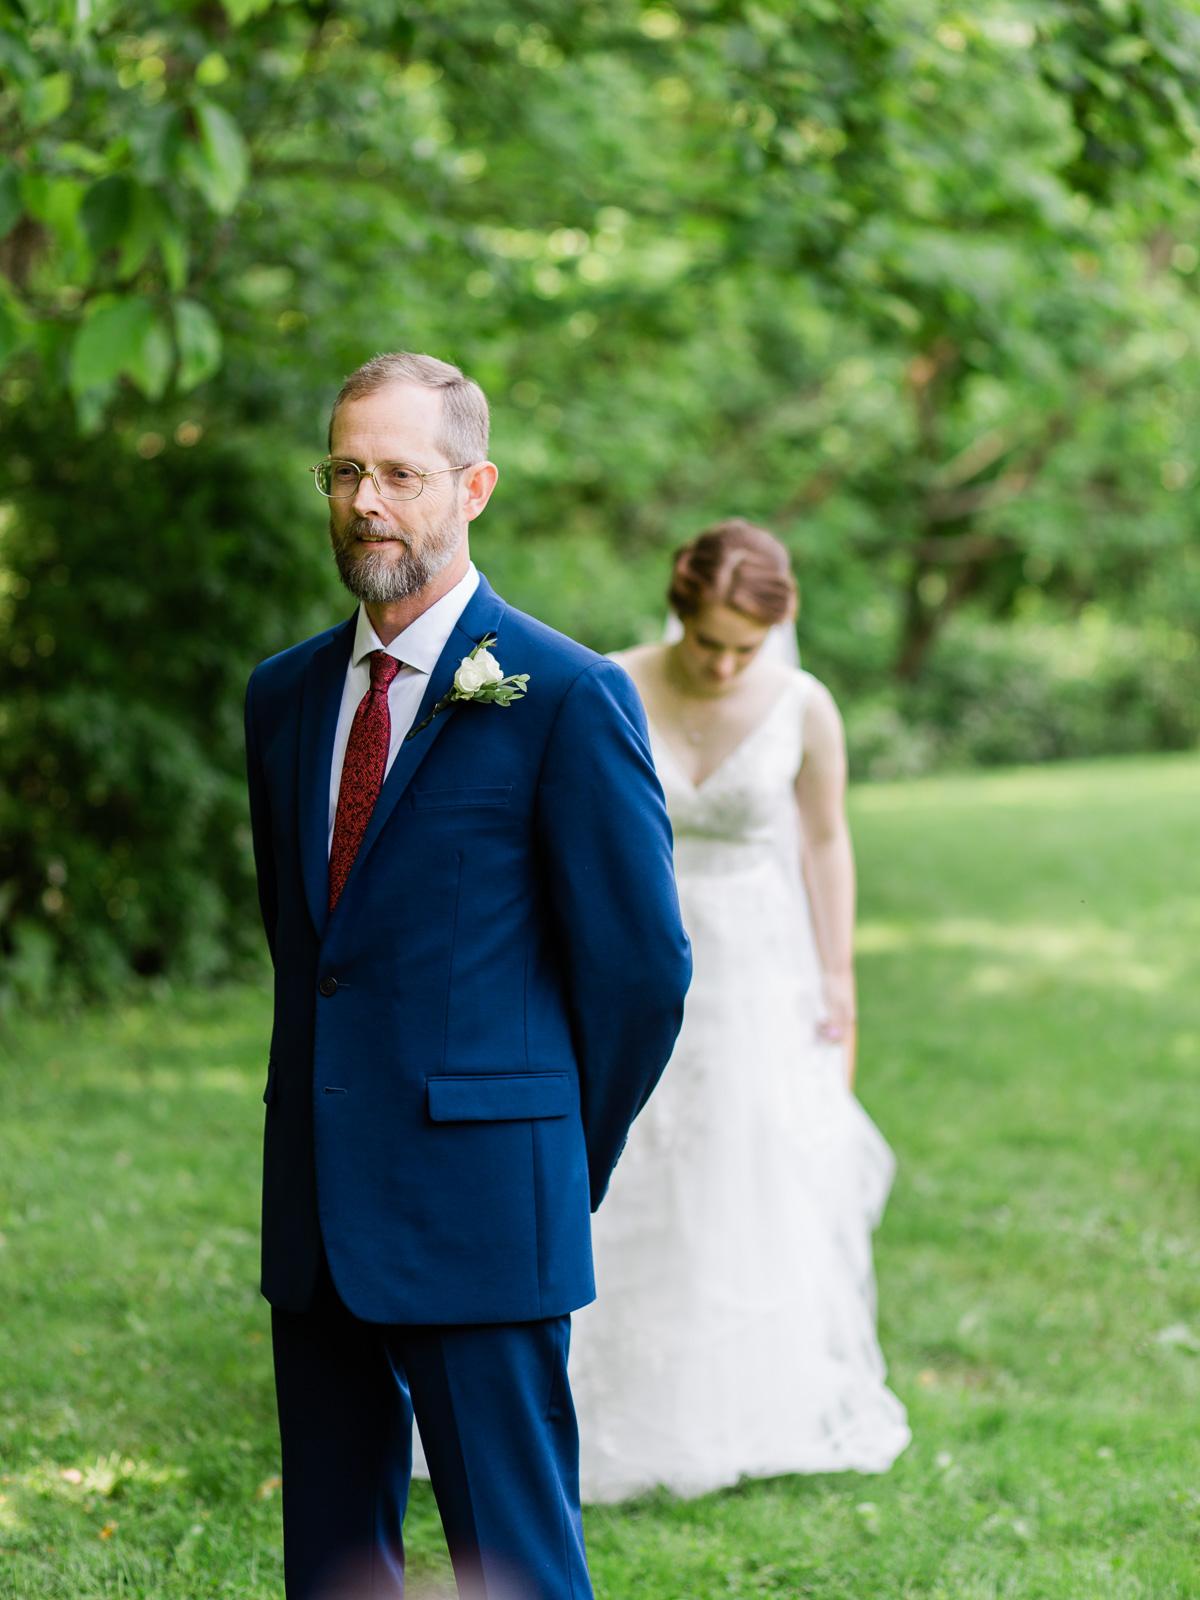 Stunning Summer Wedding in Cuyahoga Valley National Park-21.jpg